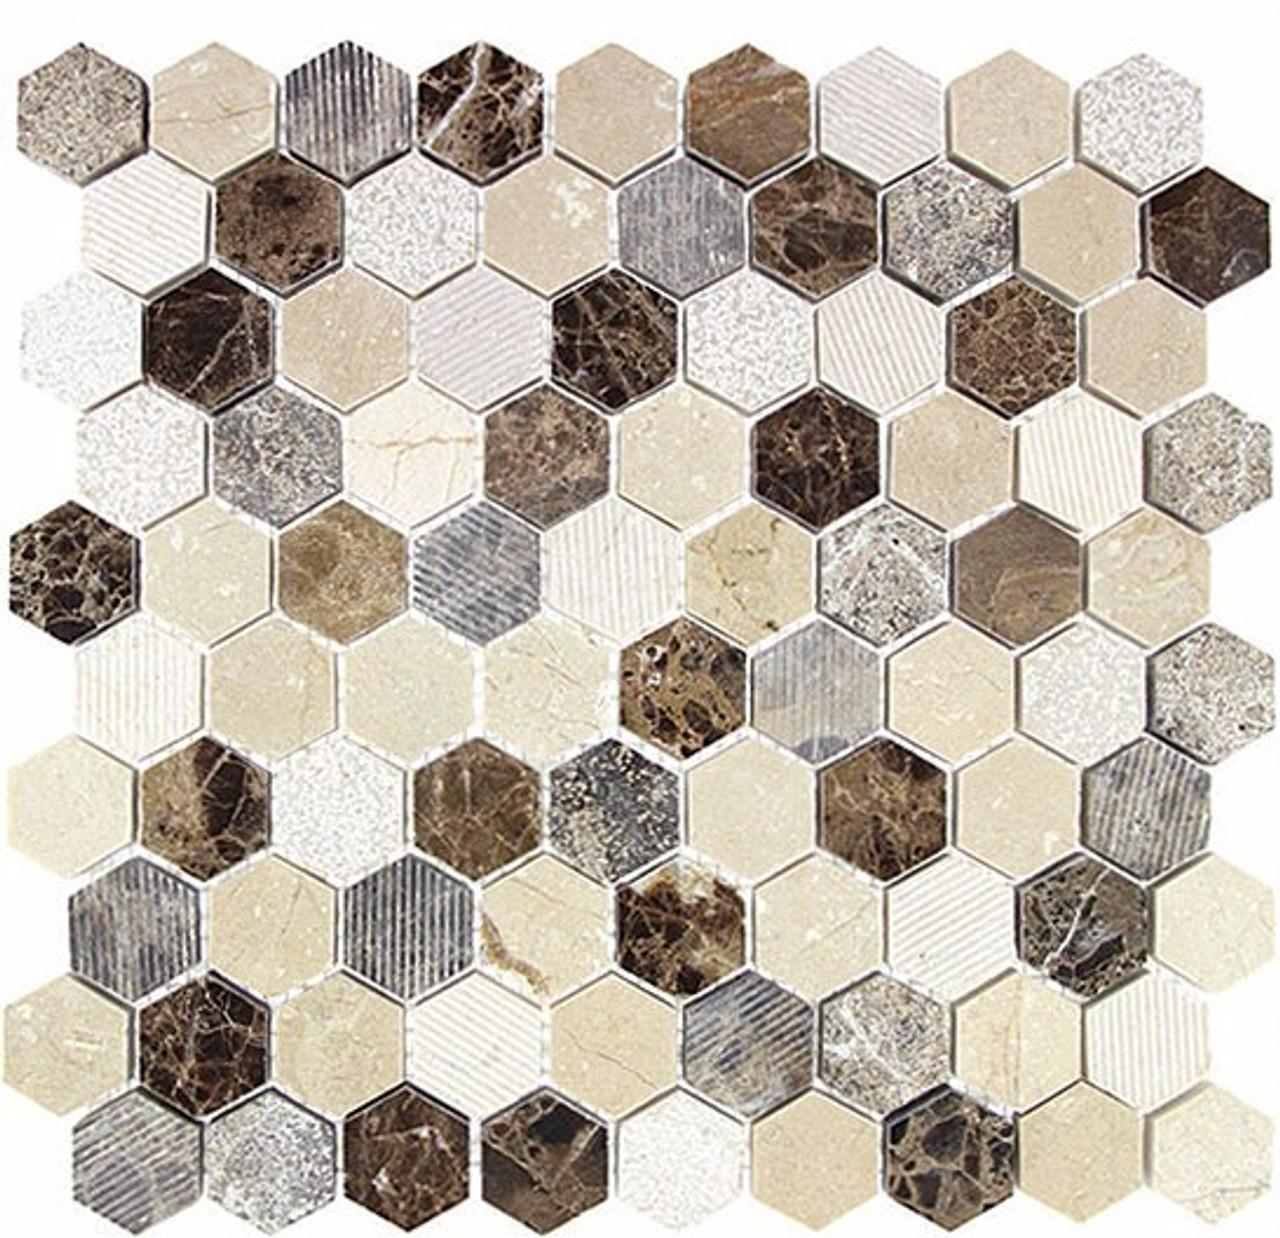 Bella Glass Tiles Excalibur Dream Gallery